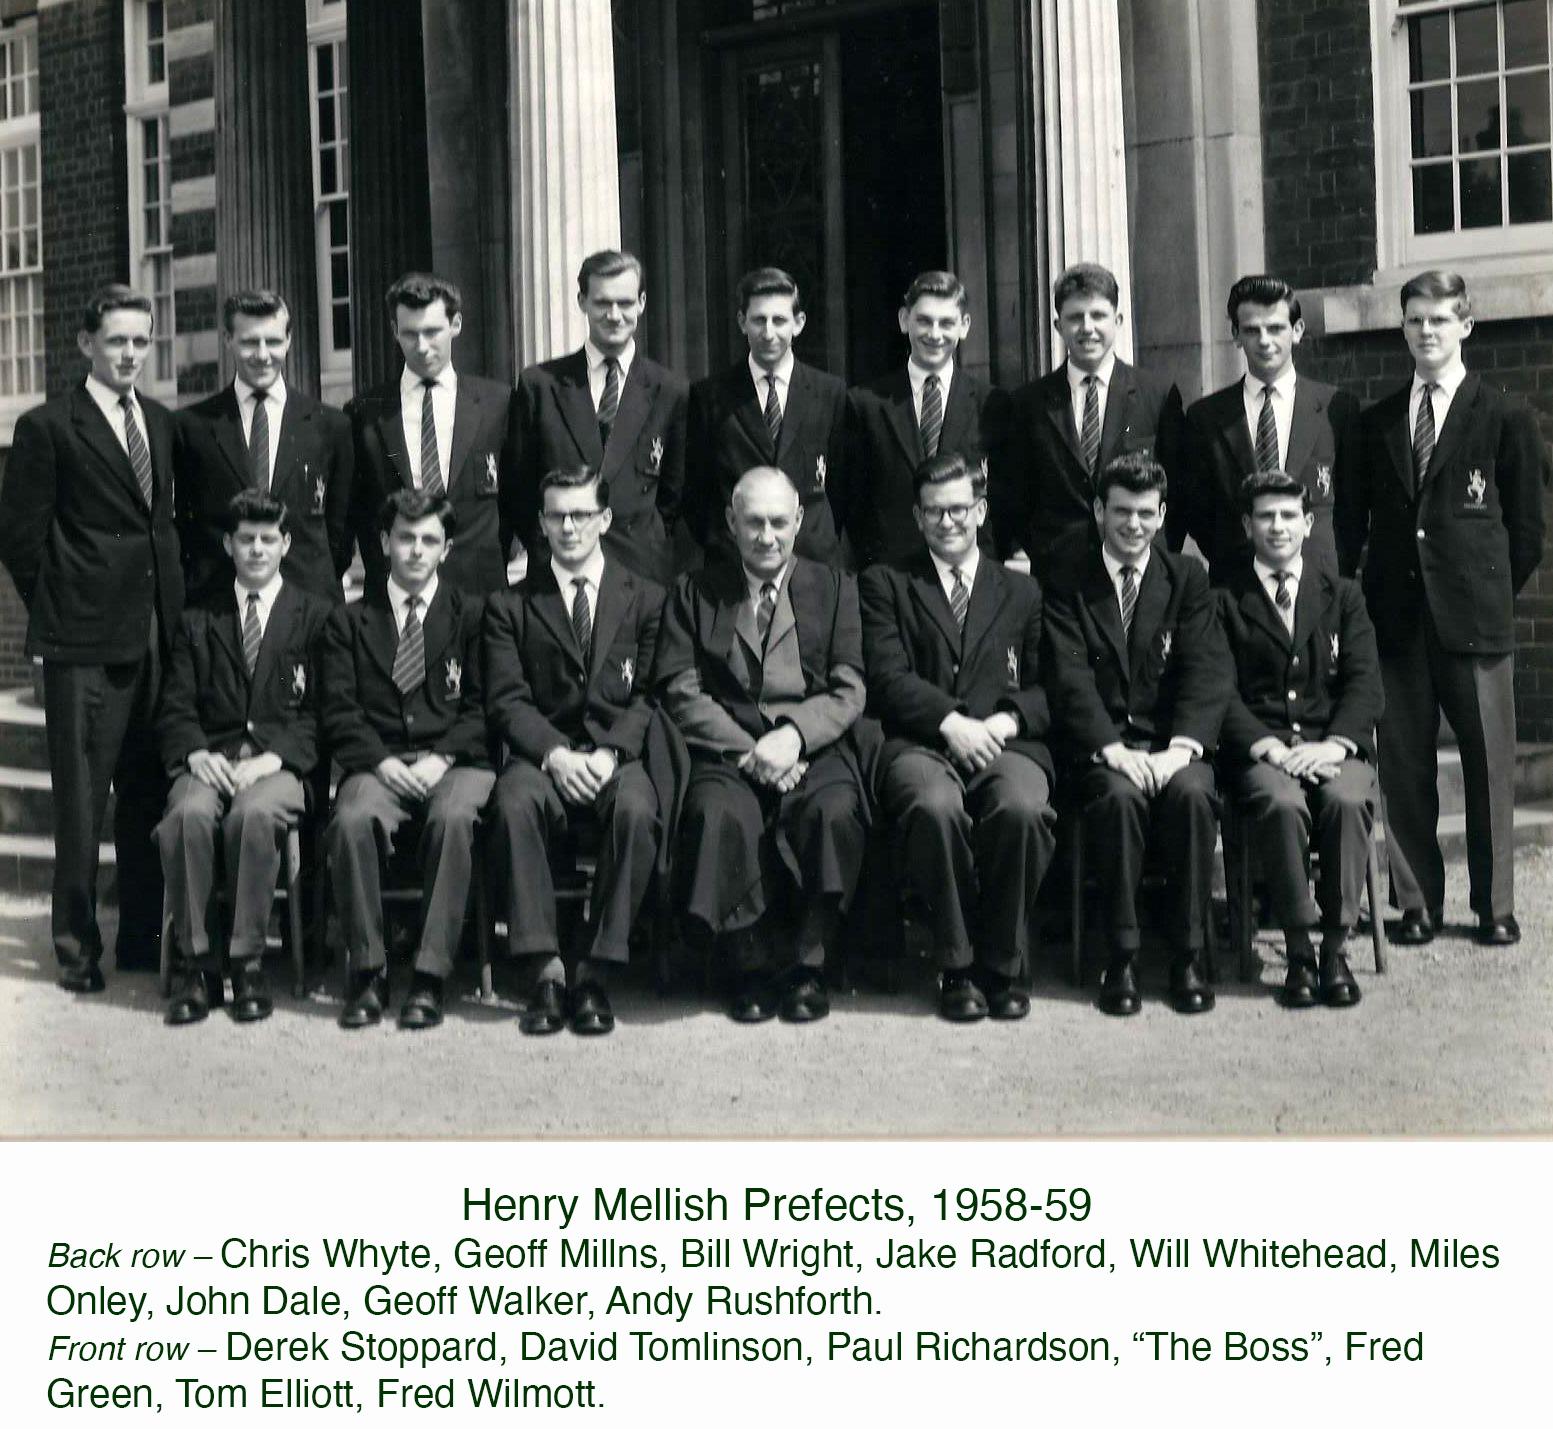 Mellish prefects 1958-9